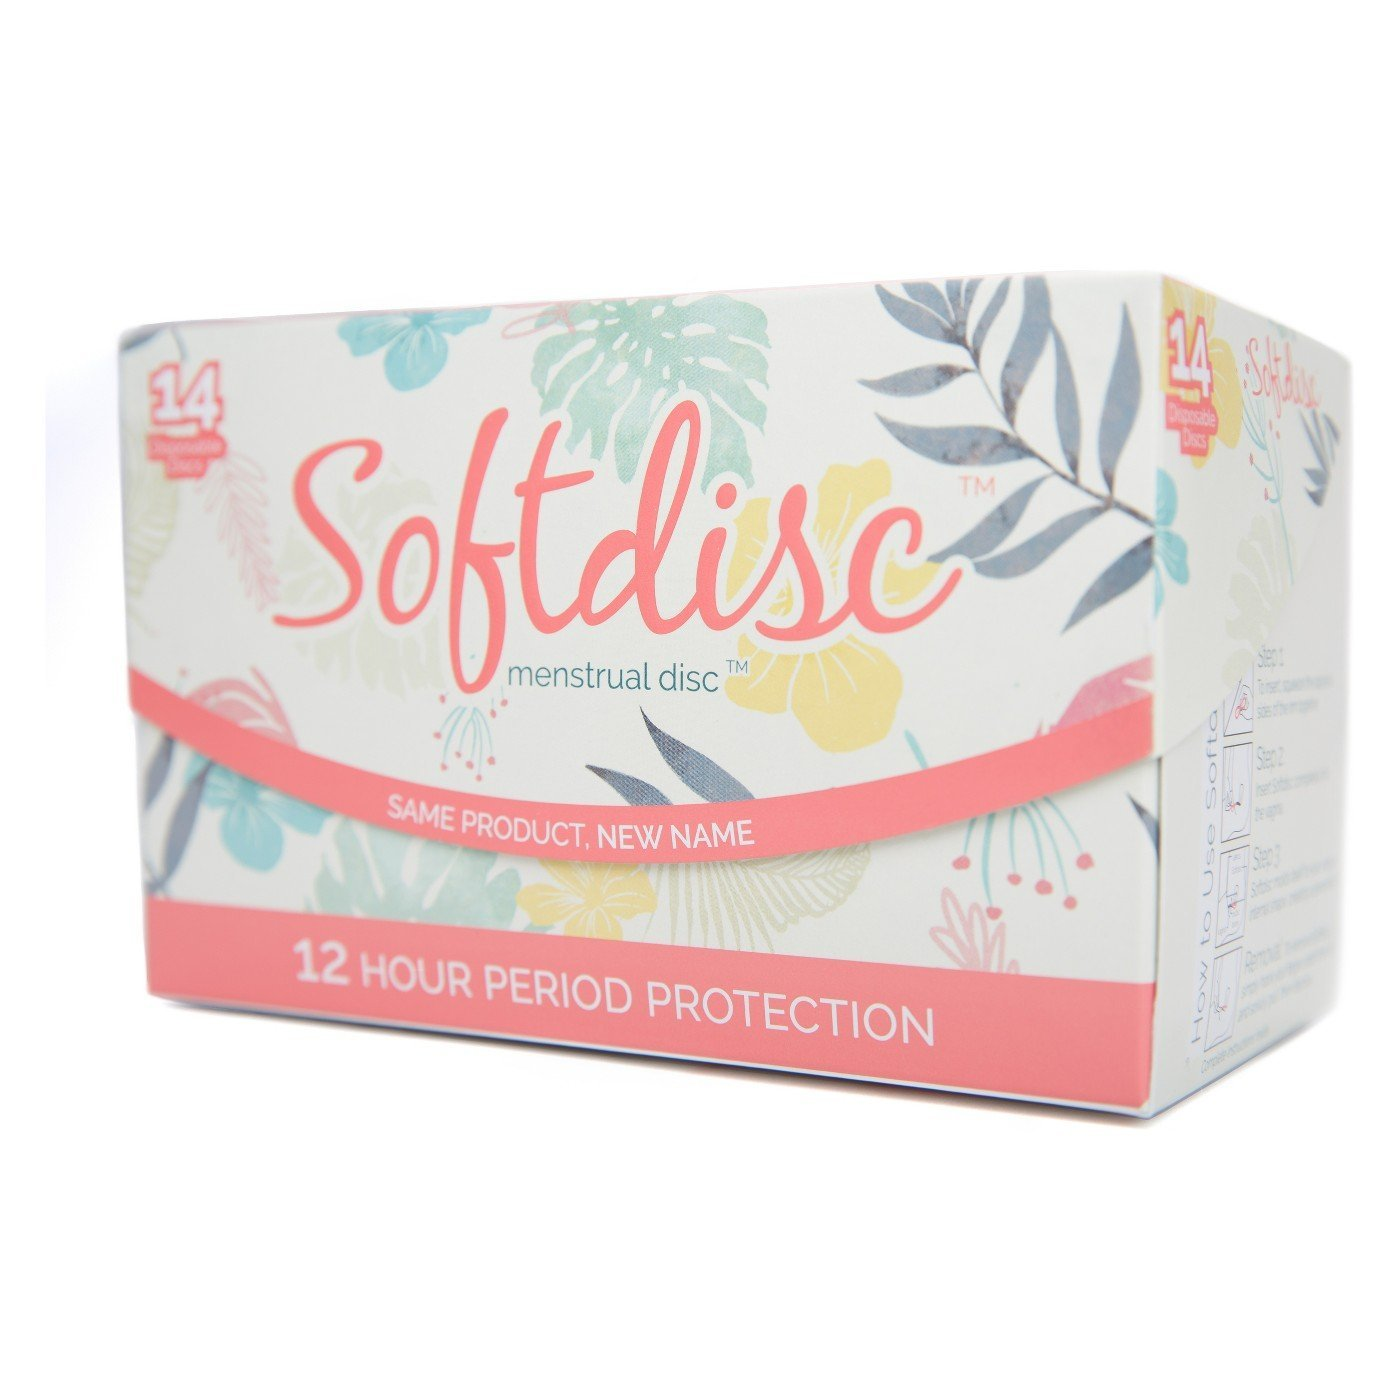 Softdisc Menstrual Discs - 14ct